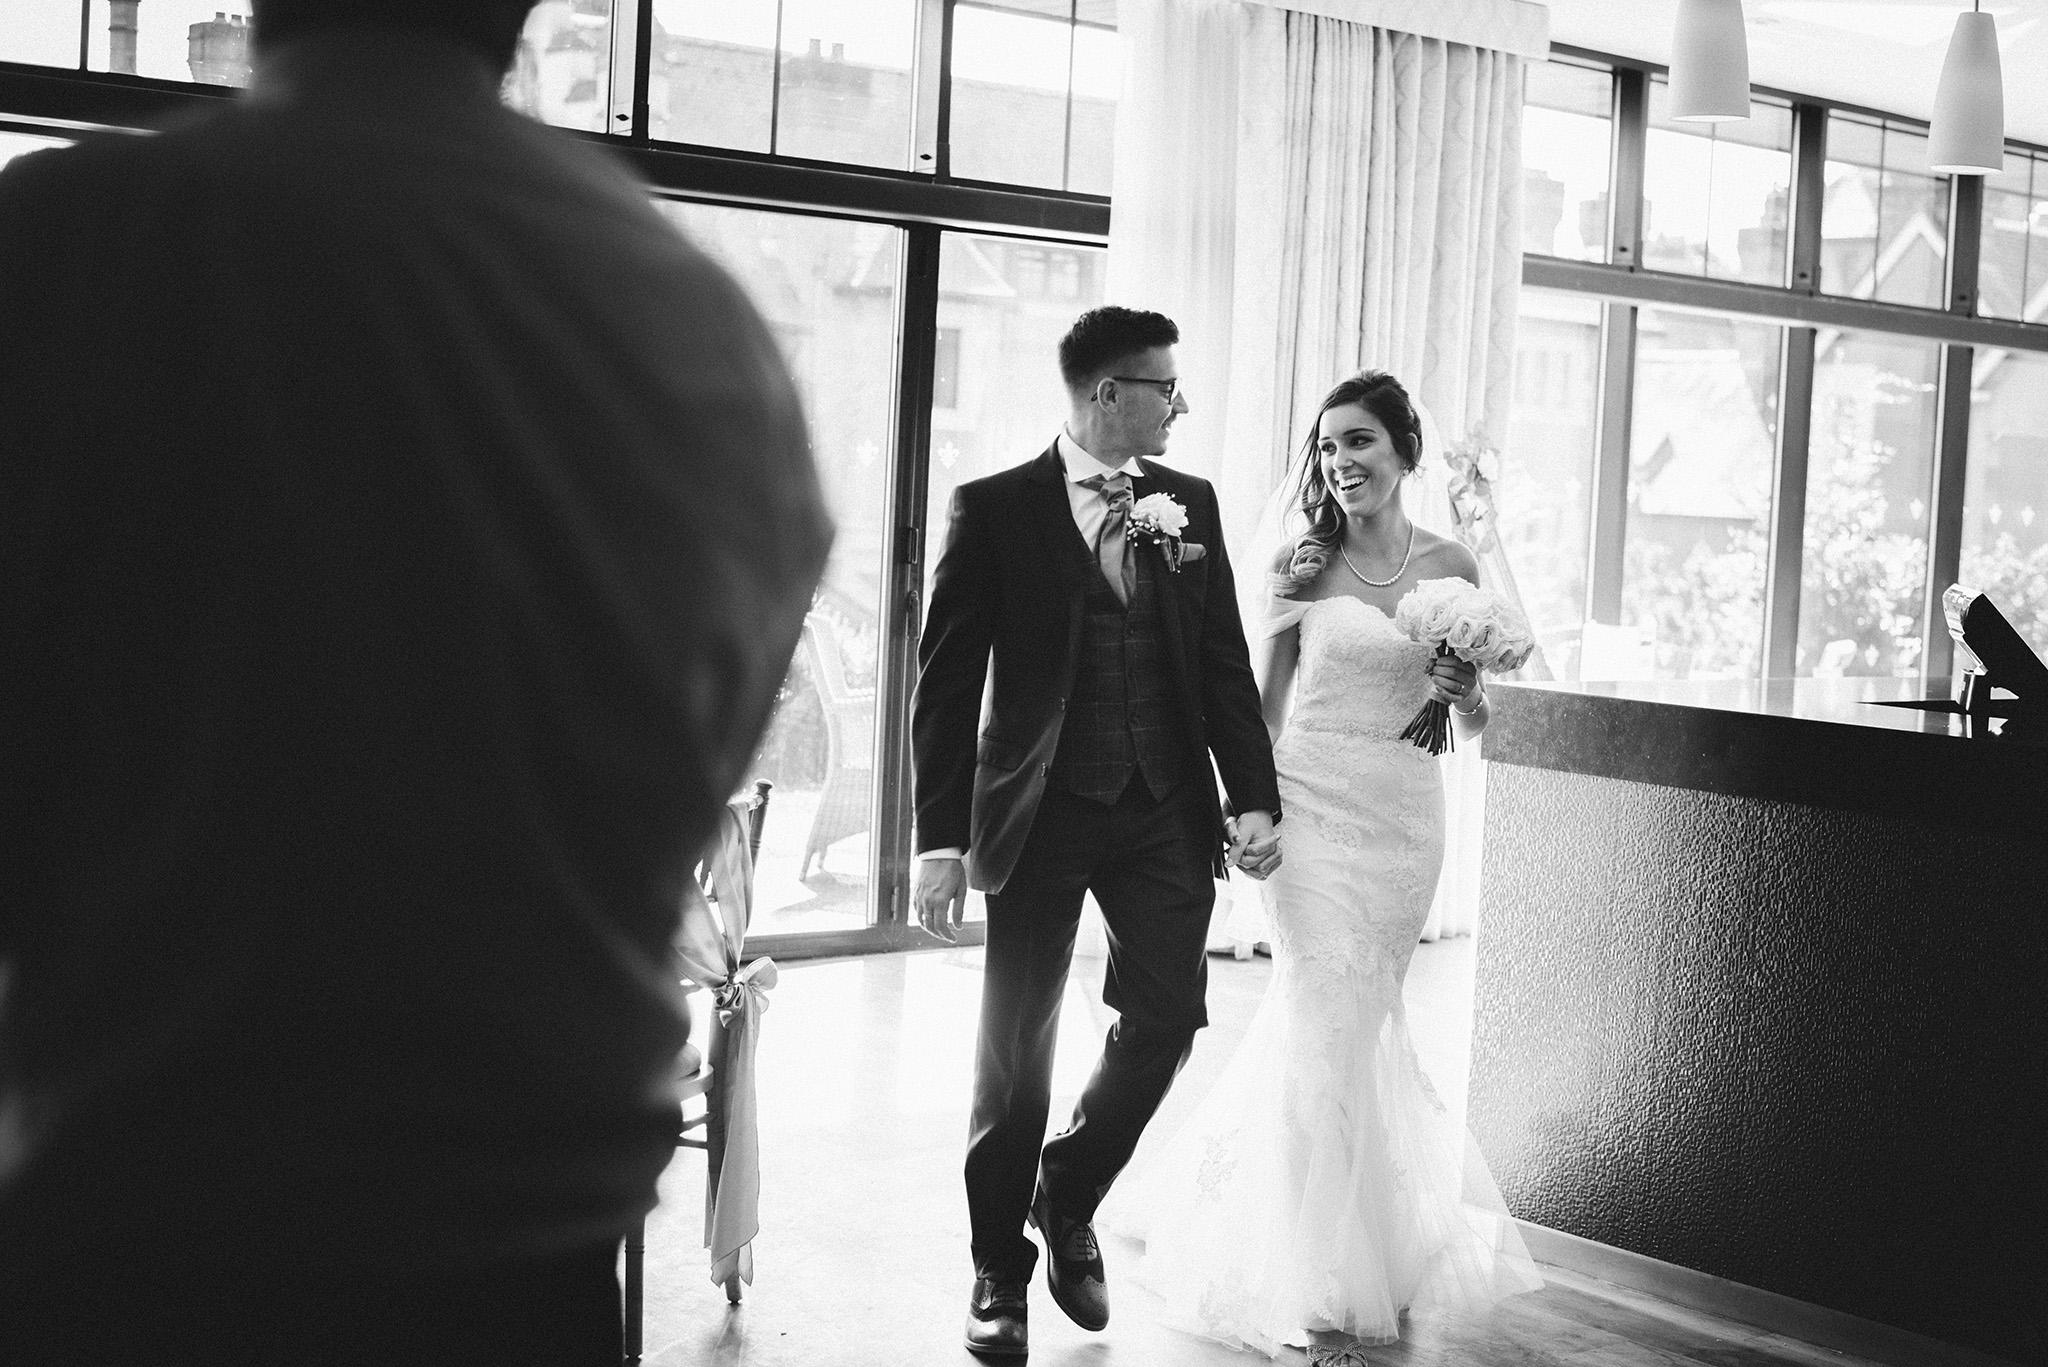 scott-stockwell-photography-wedding-11.jpg